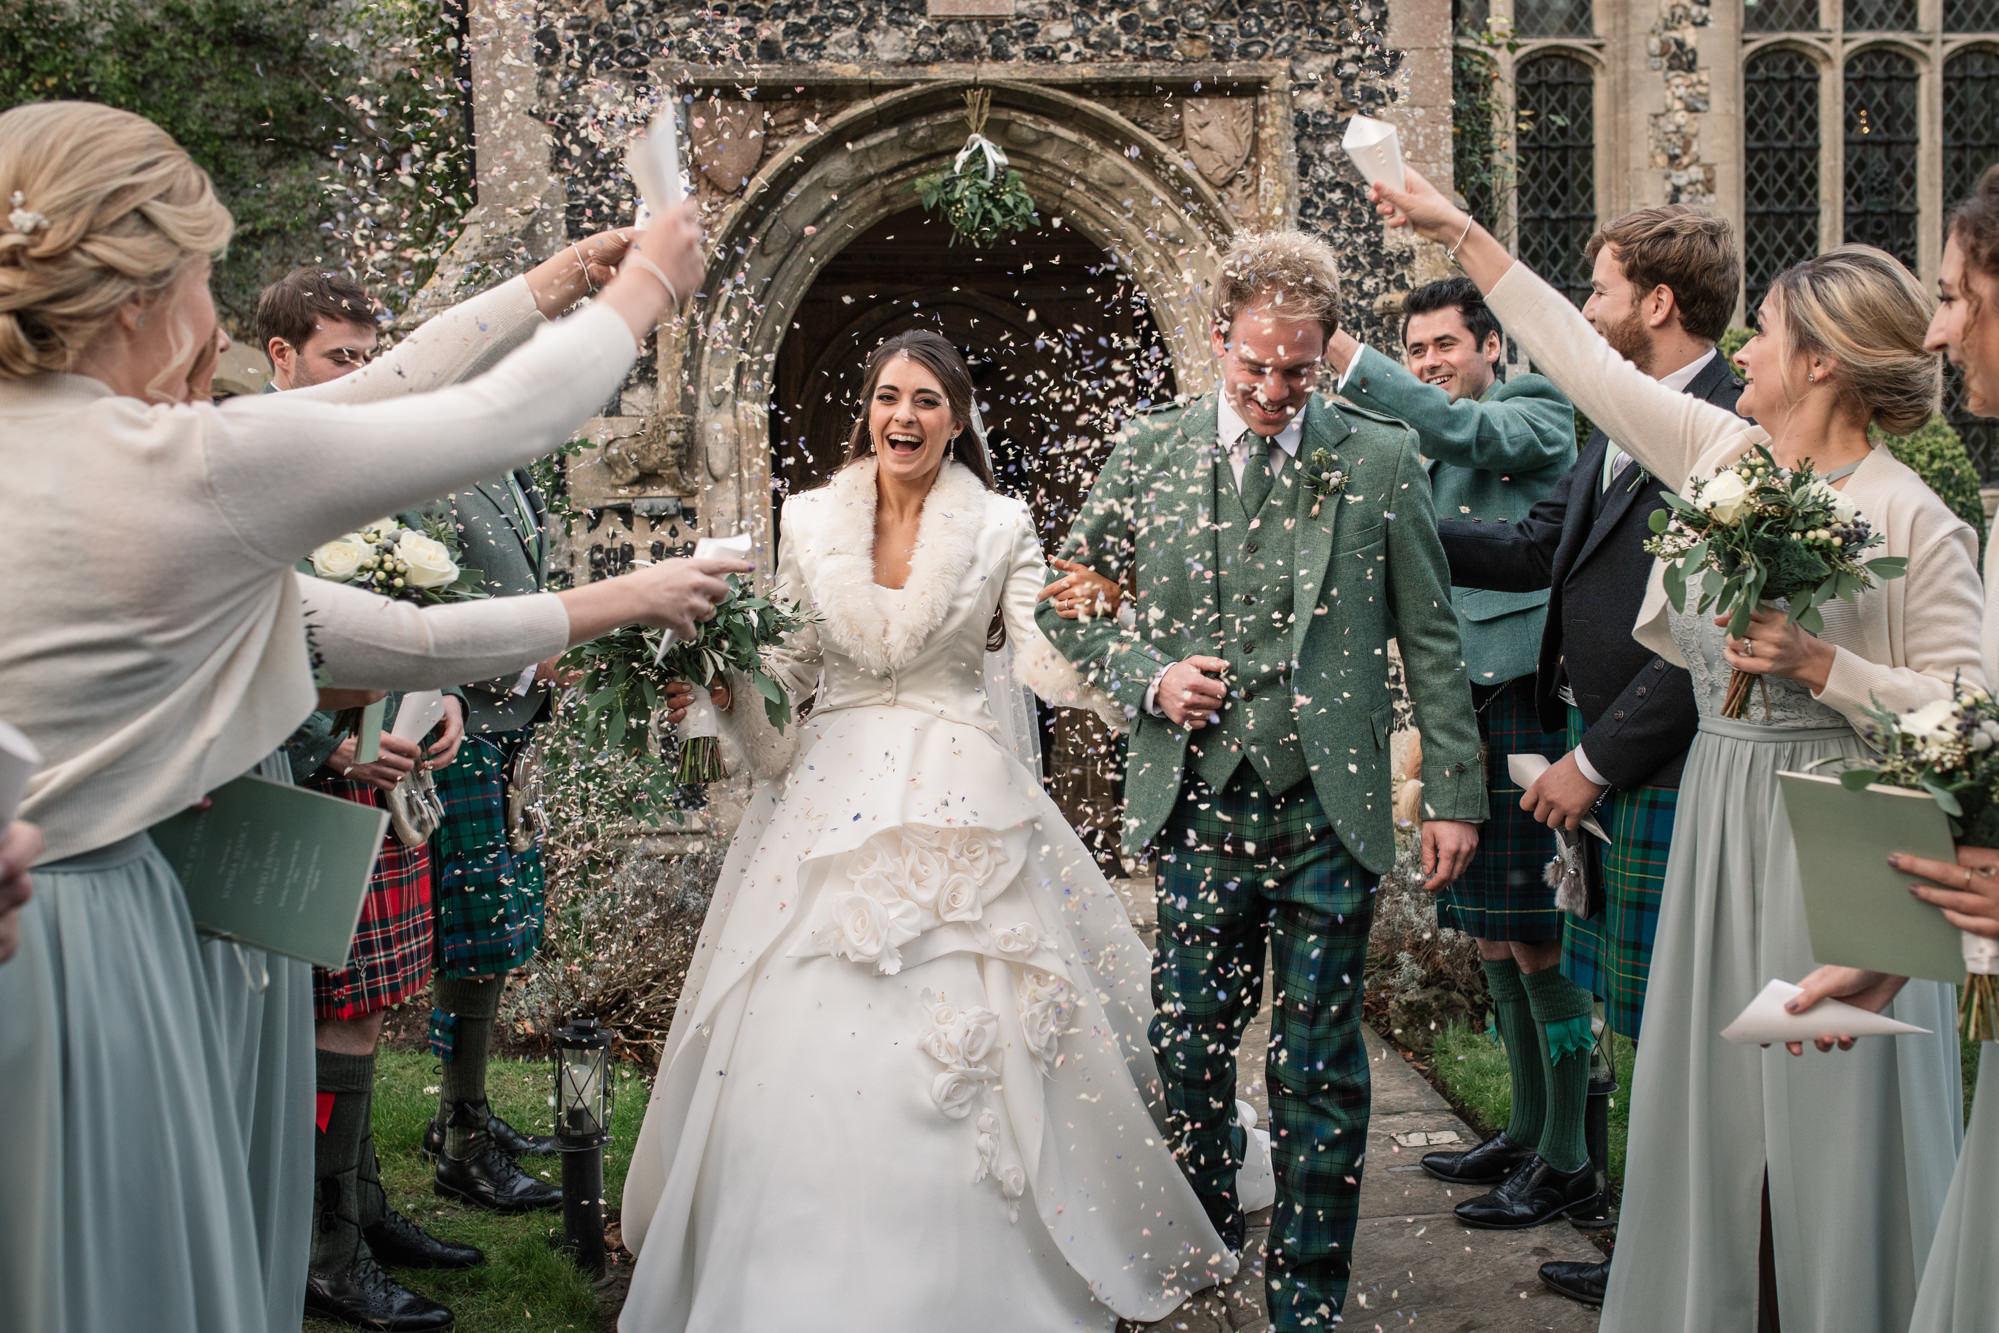 Confetti throwing outside church of winter wedding